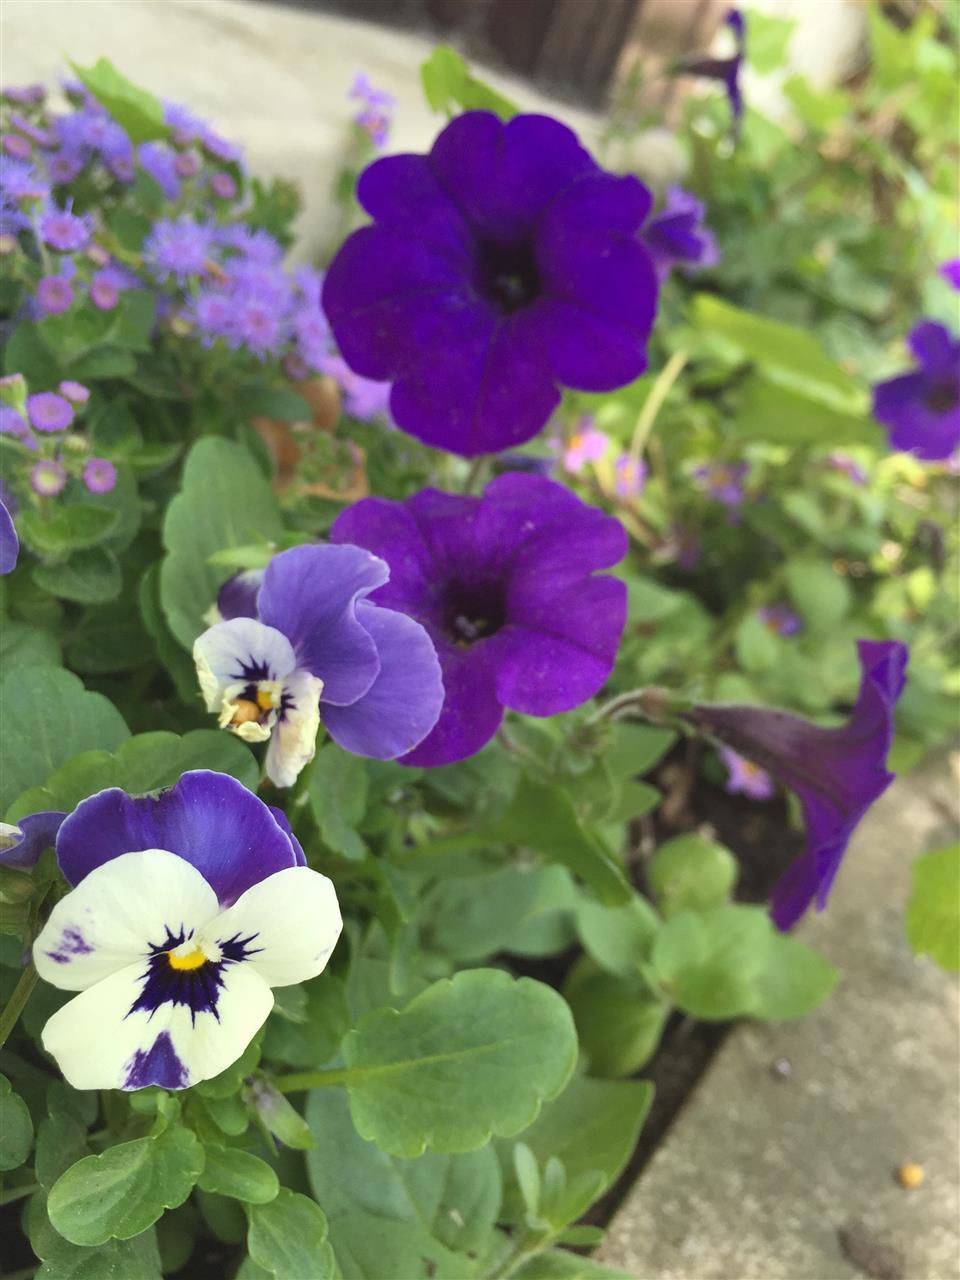 Flowers in bloom. Birmingham, Michigan #LeadingRElocal #Birmingham #Michigan